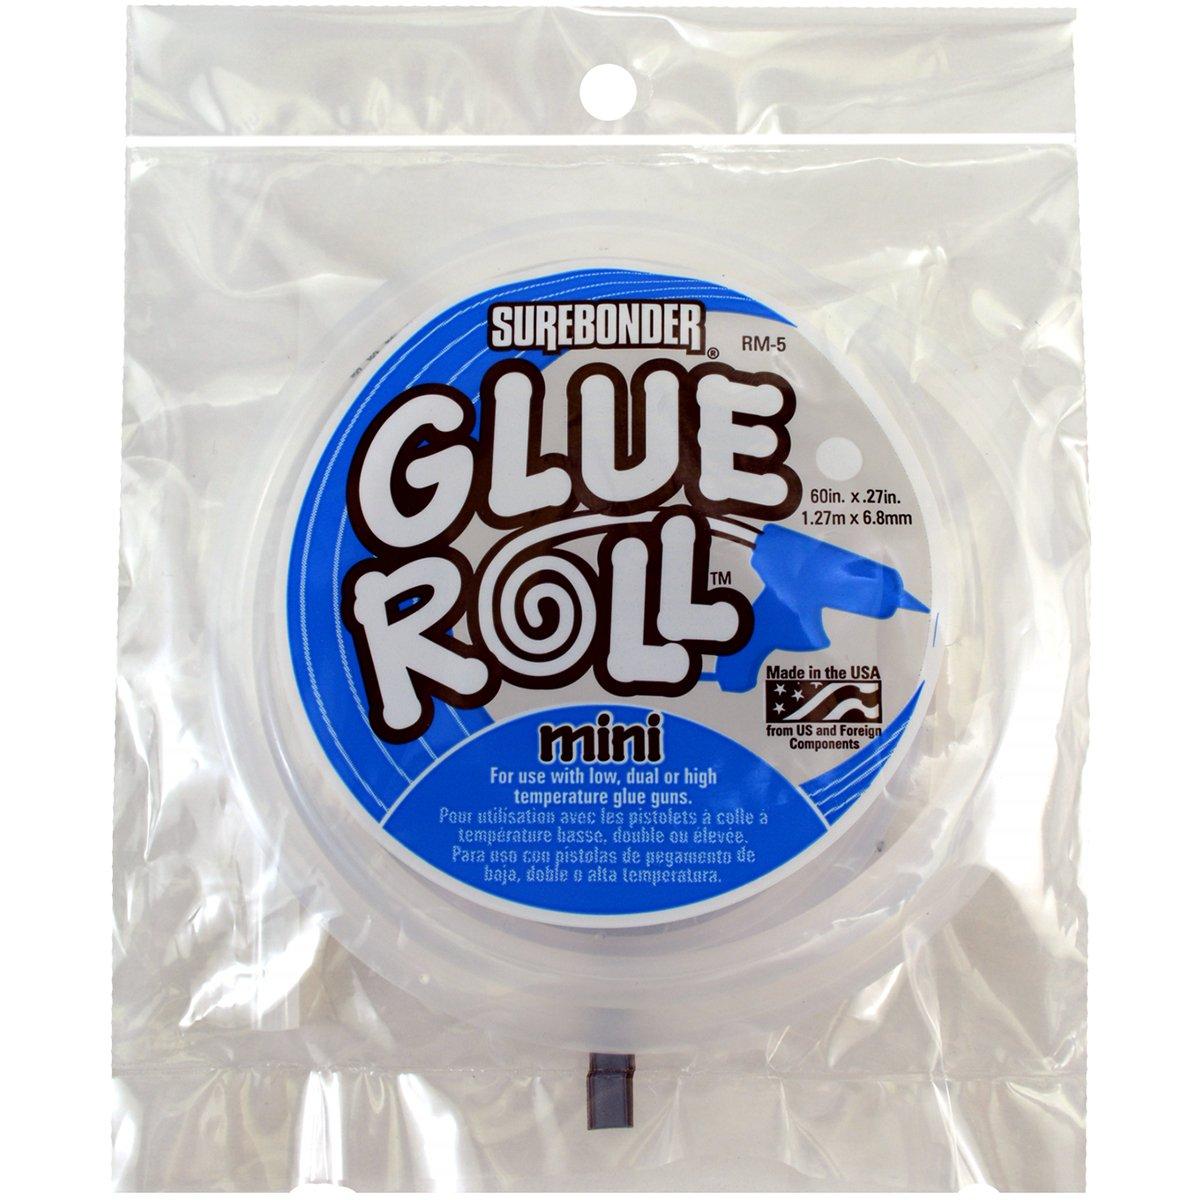 Surebonder RM-5 All-Temperature Glue Roll, 60in. x 27in./Mini/5'